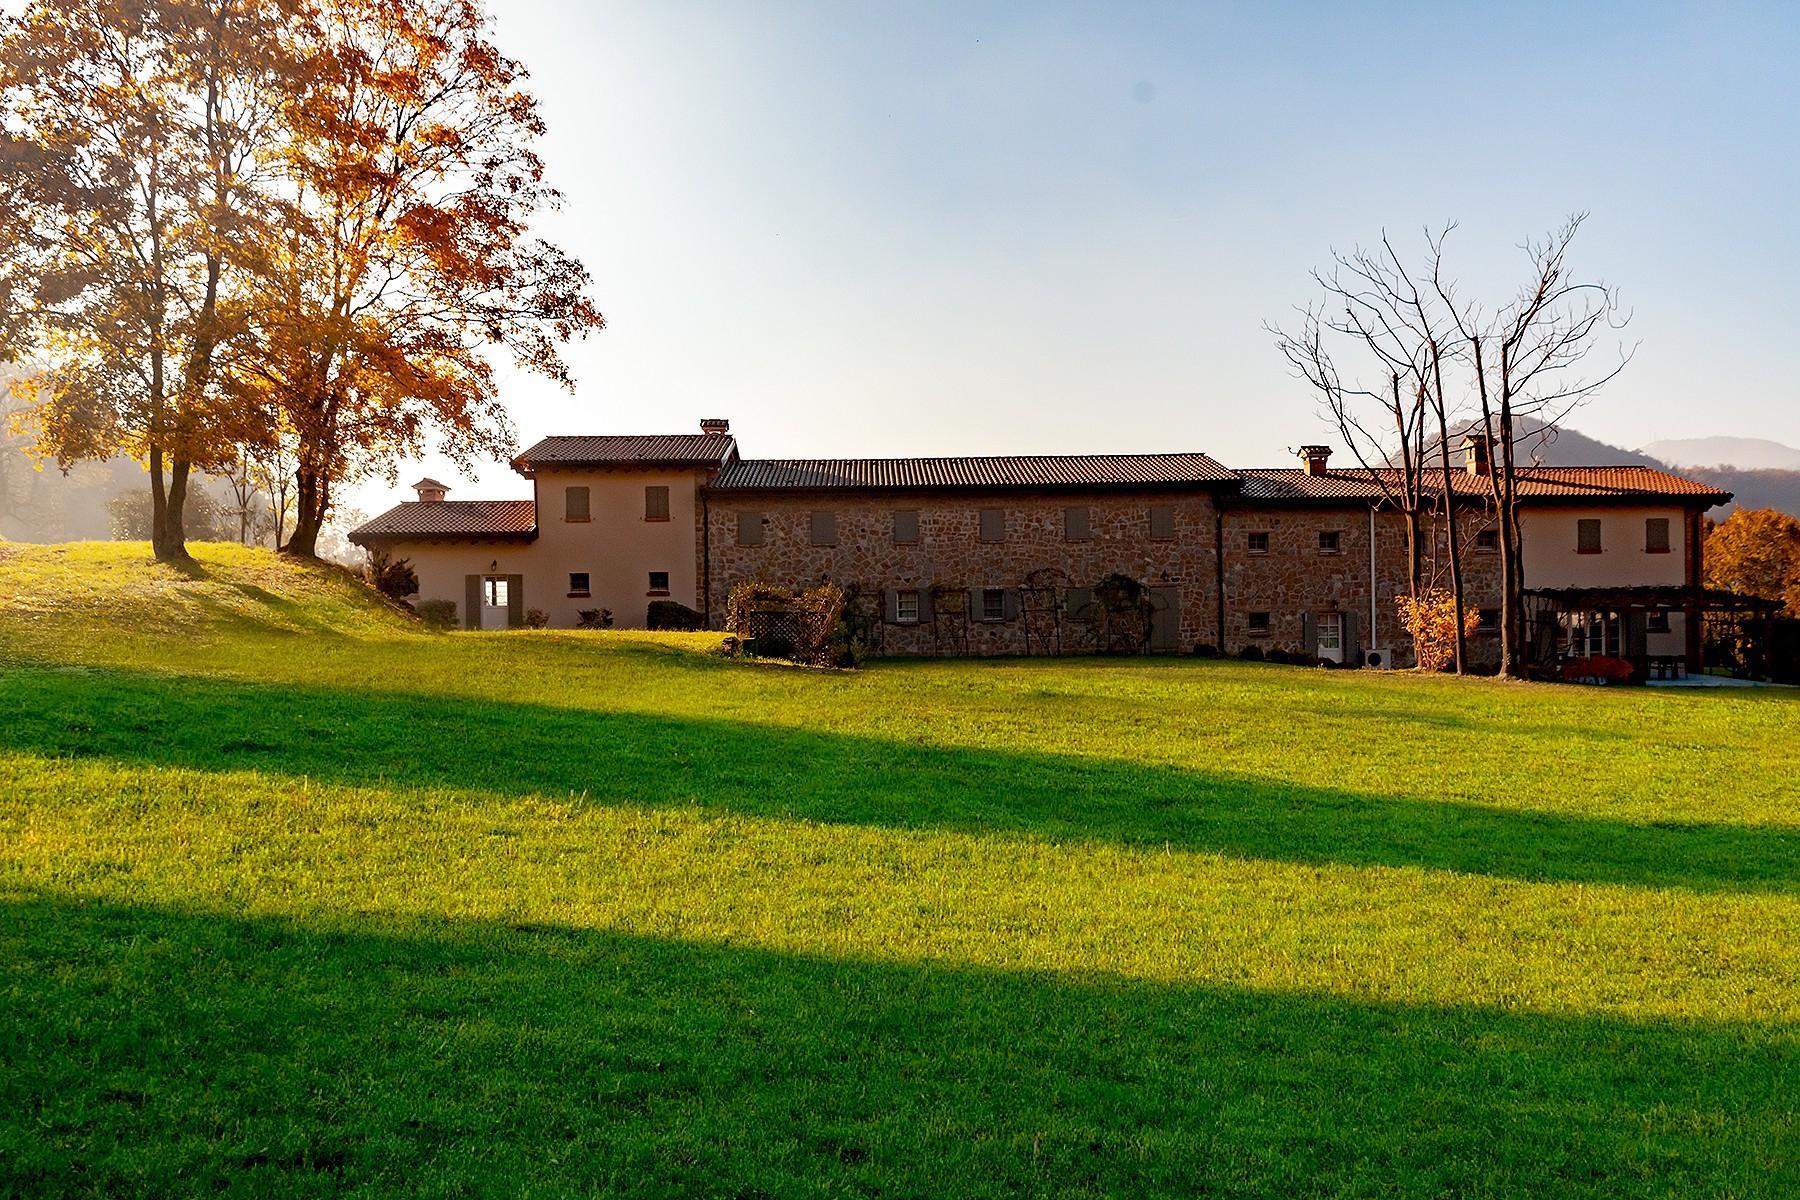 Rustico in Vendita a Padova: 5 locali, 850 mq - Foto 5